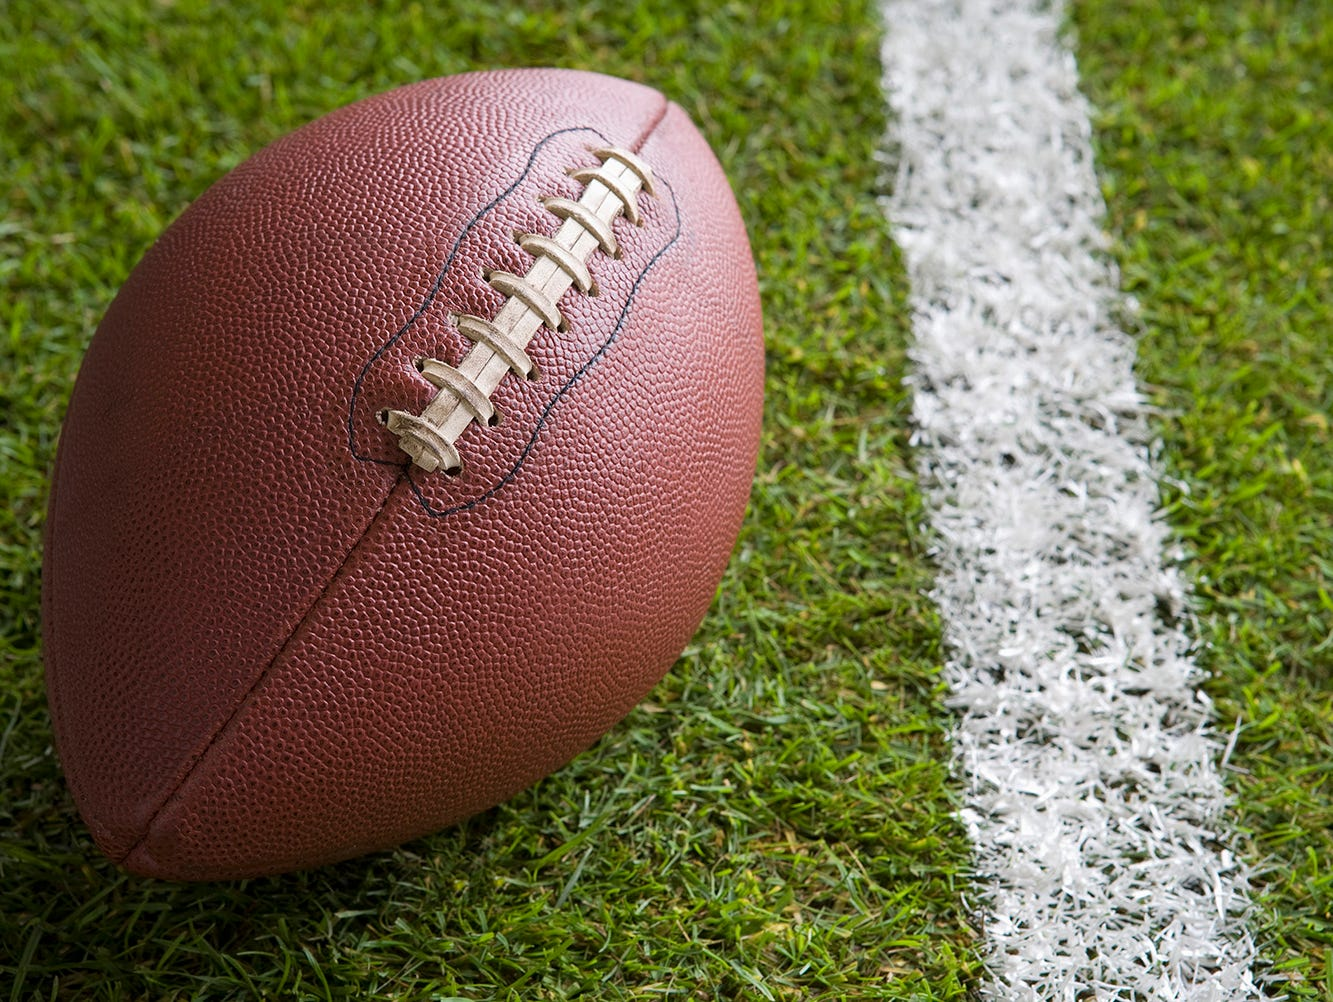 lh logo: football